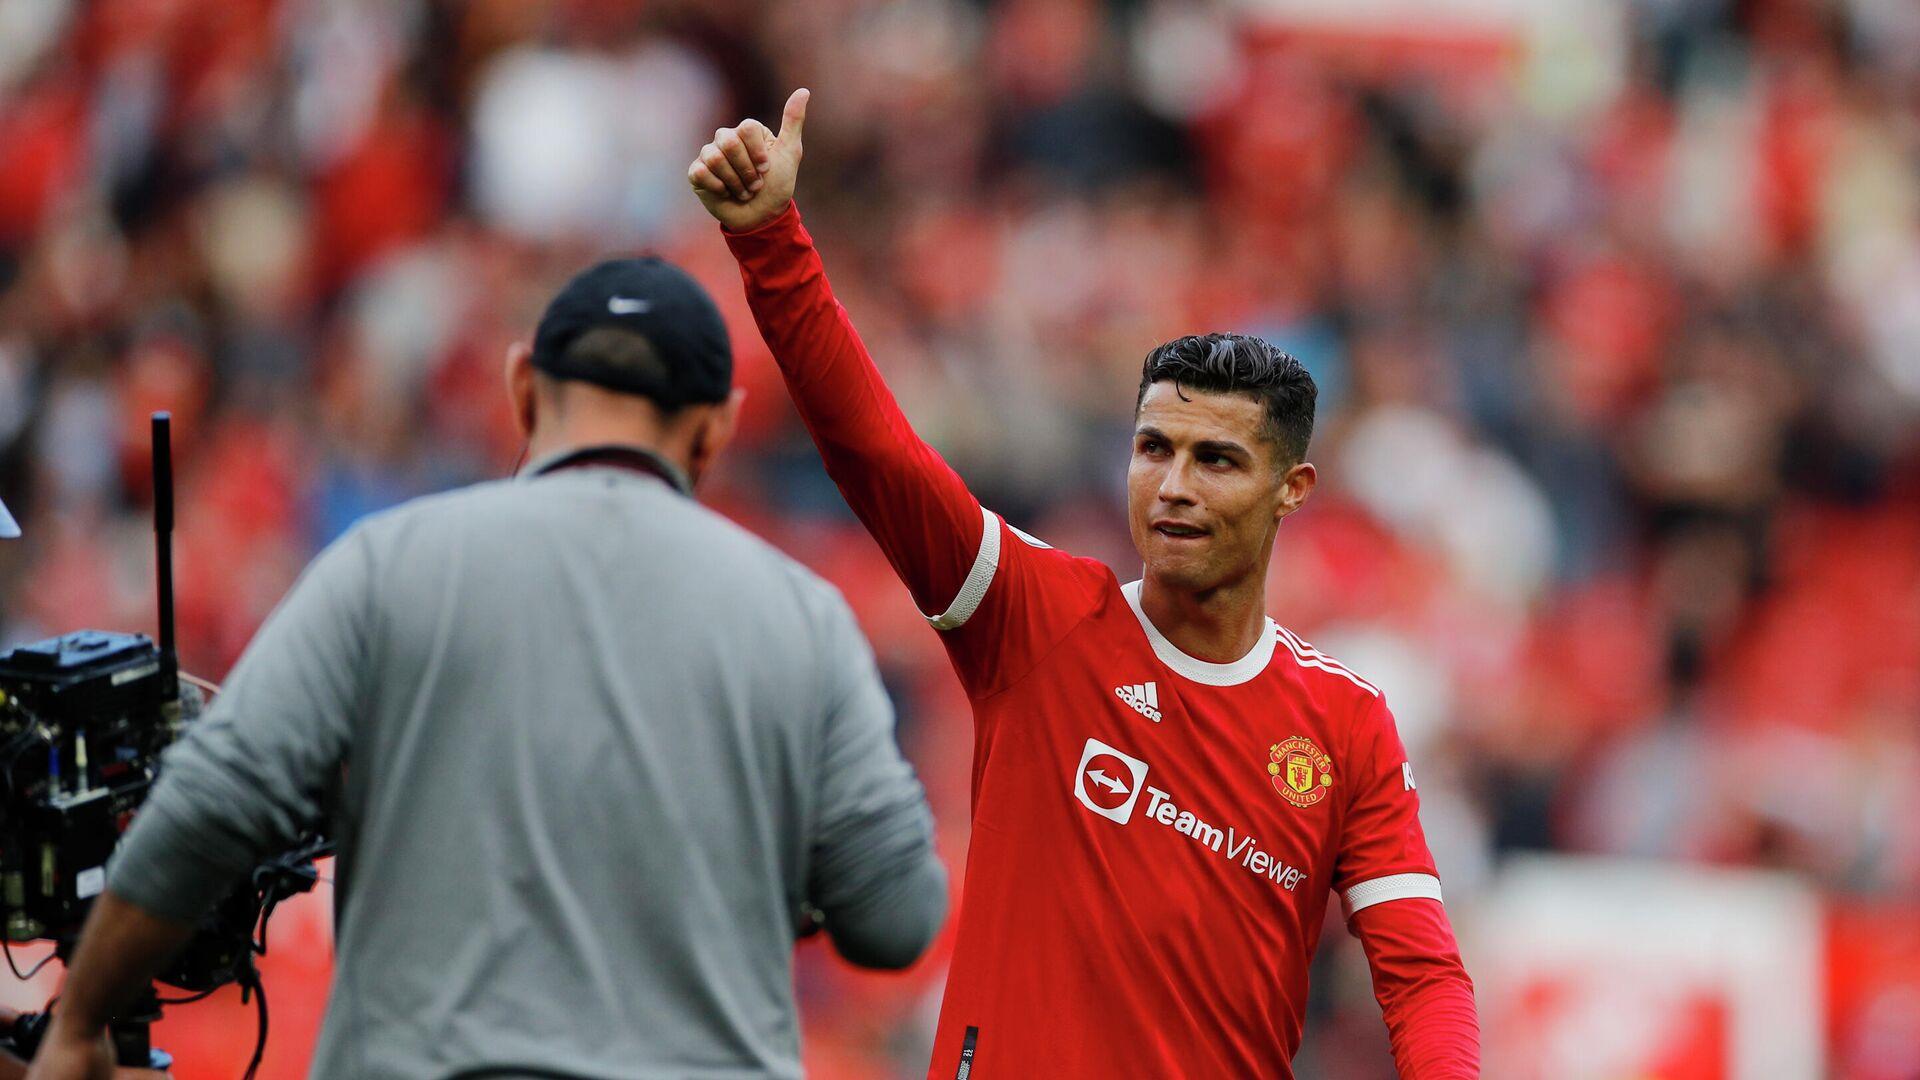 Manchester United's Cristiano Ronaldo celebrates after the match  - Sputnik International, 1920, 12.09.2021